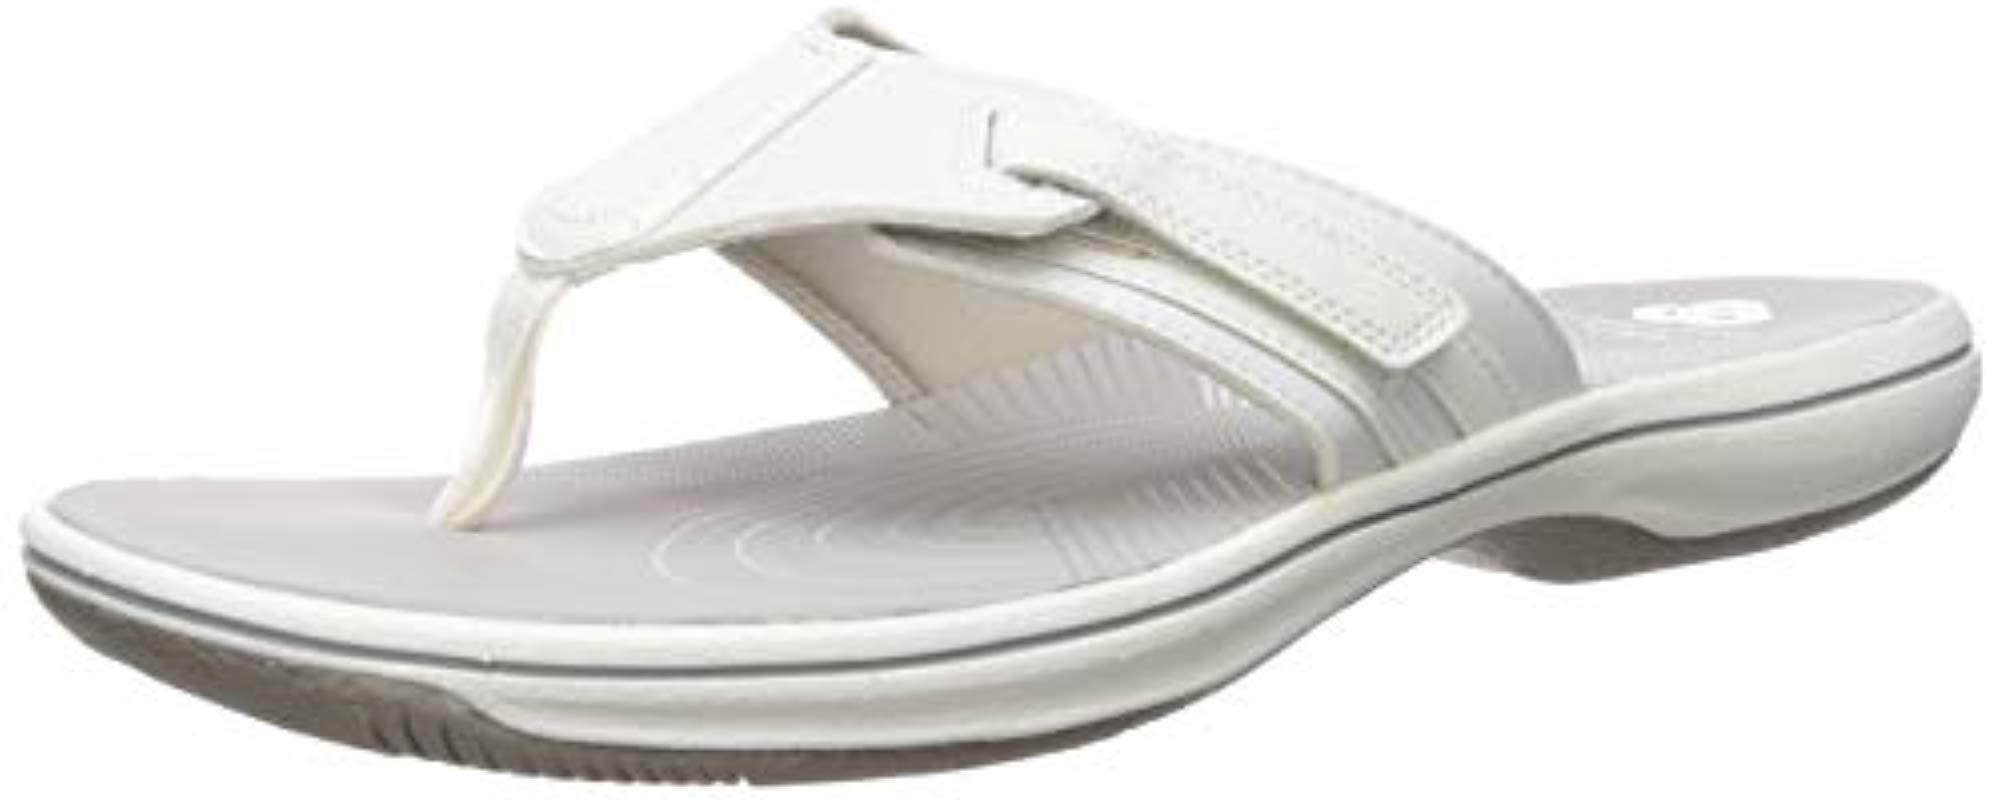 Size 6.0 Clarks Women/'s Brinkley Sail Flip-Flop Navy Synthetic